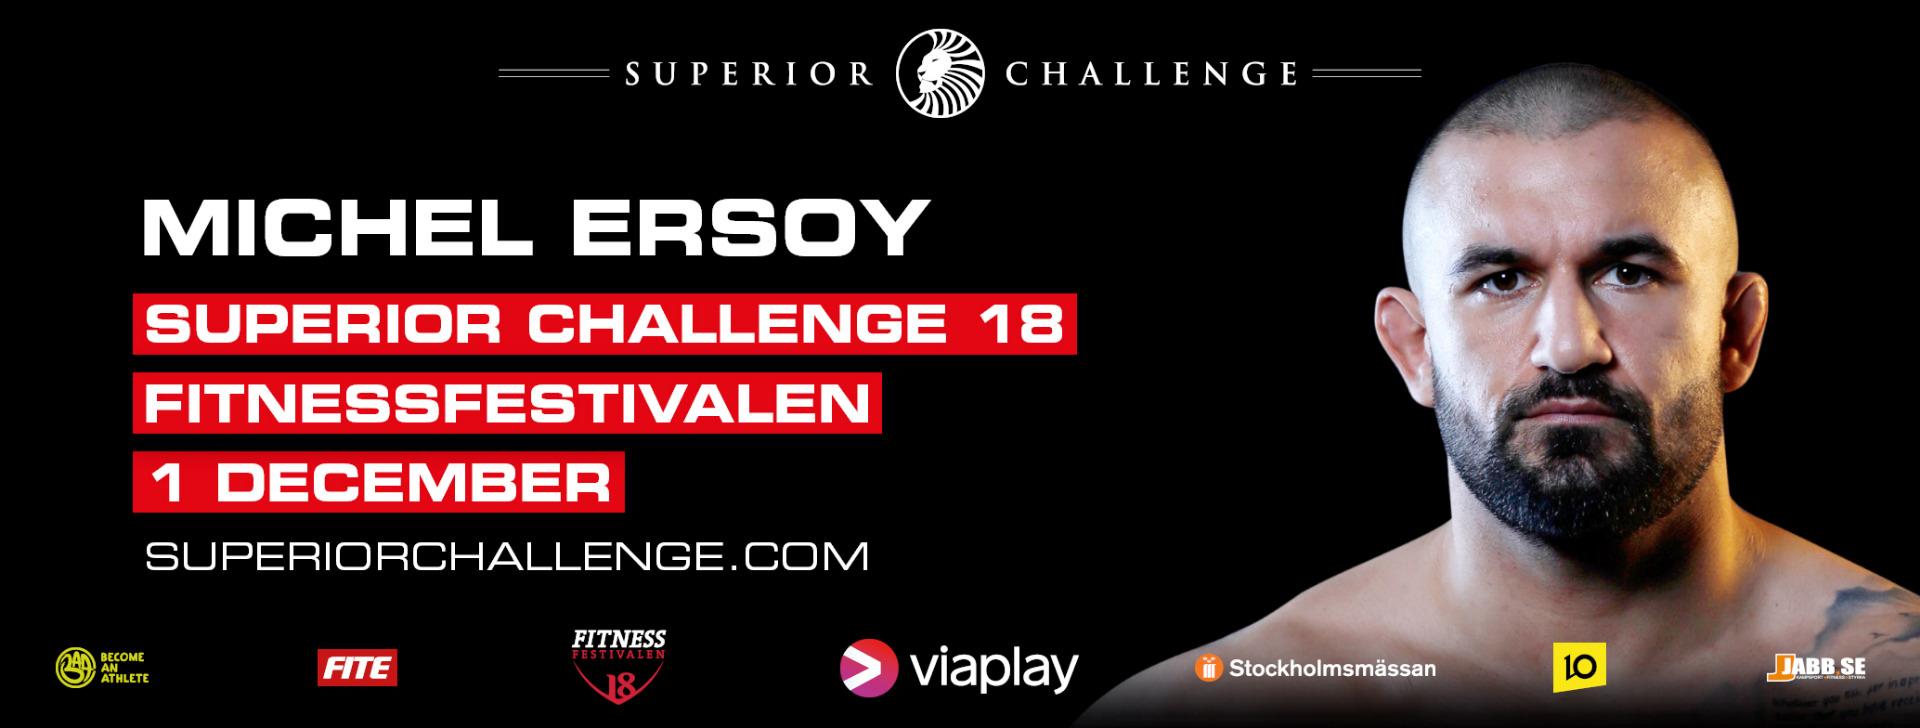 Michel Ersoy Superior Challenge 18 Fitnessfestivalen